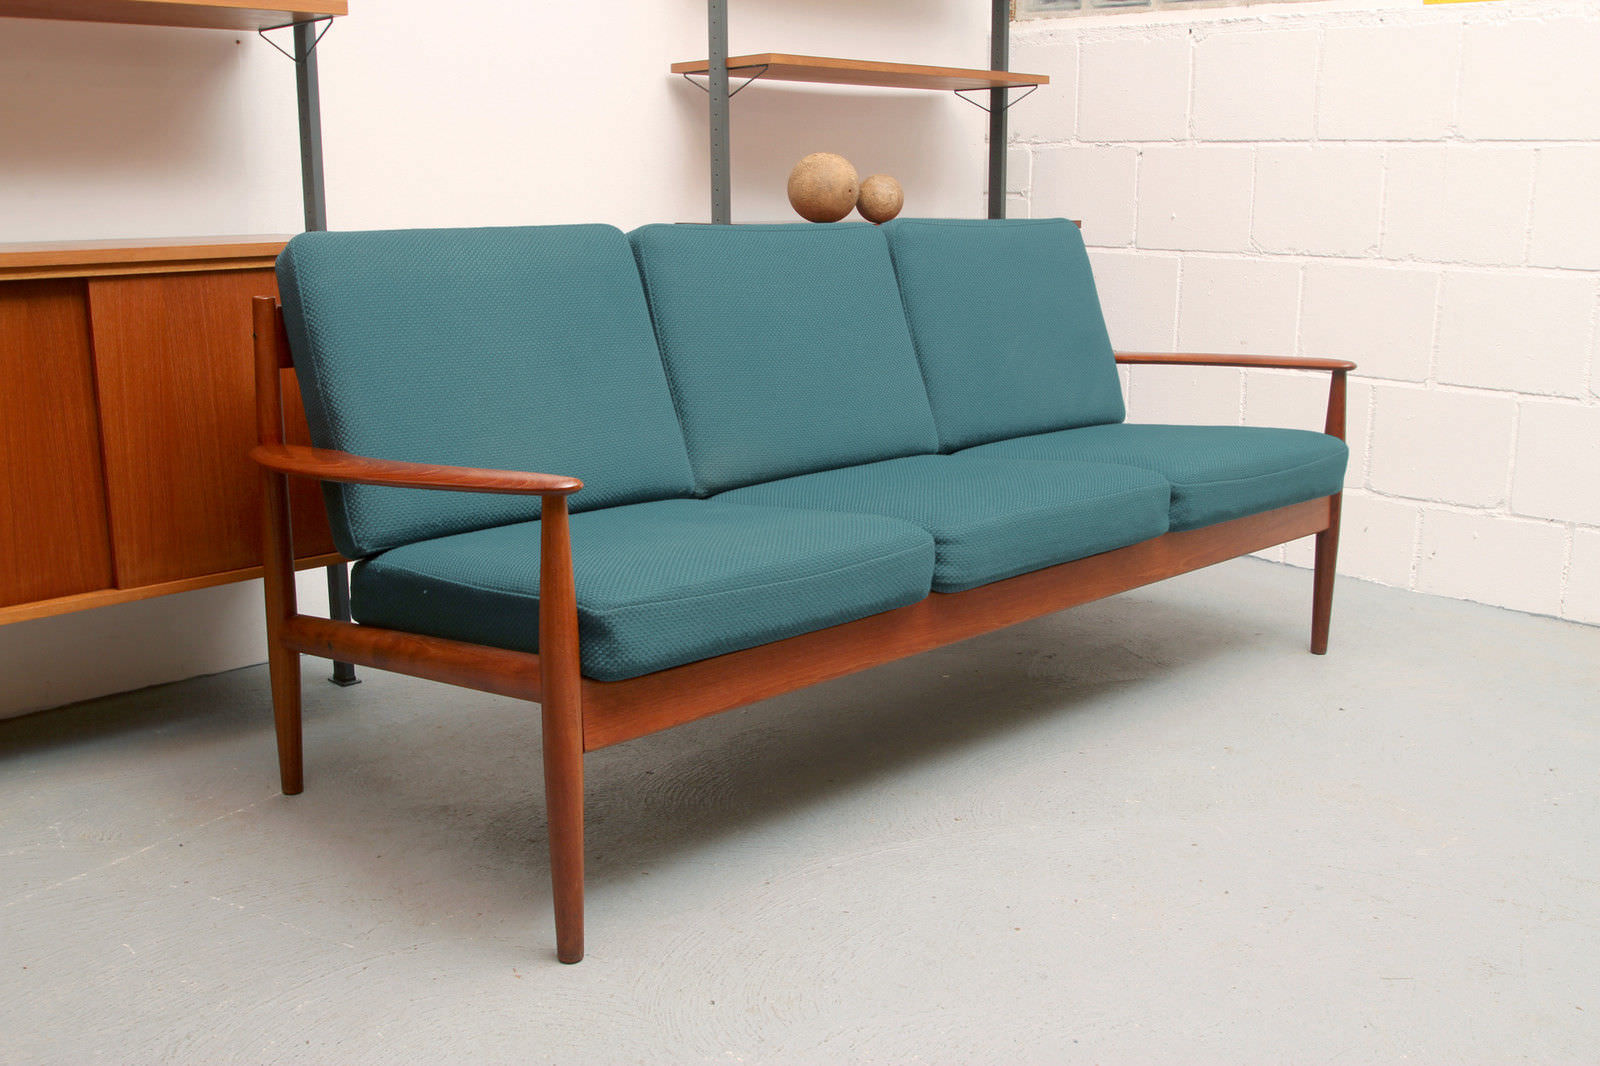 Minimalismus-Sofa